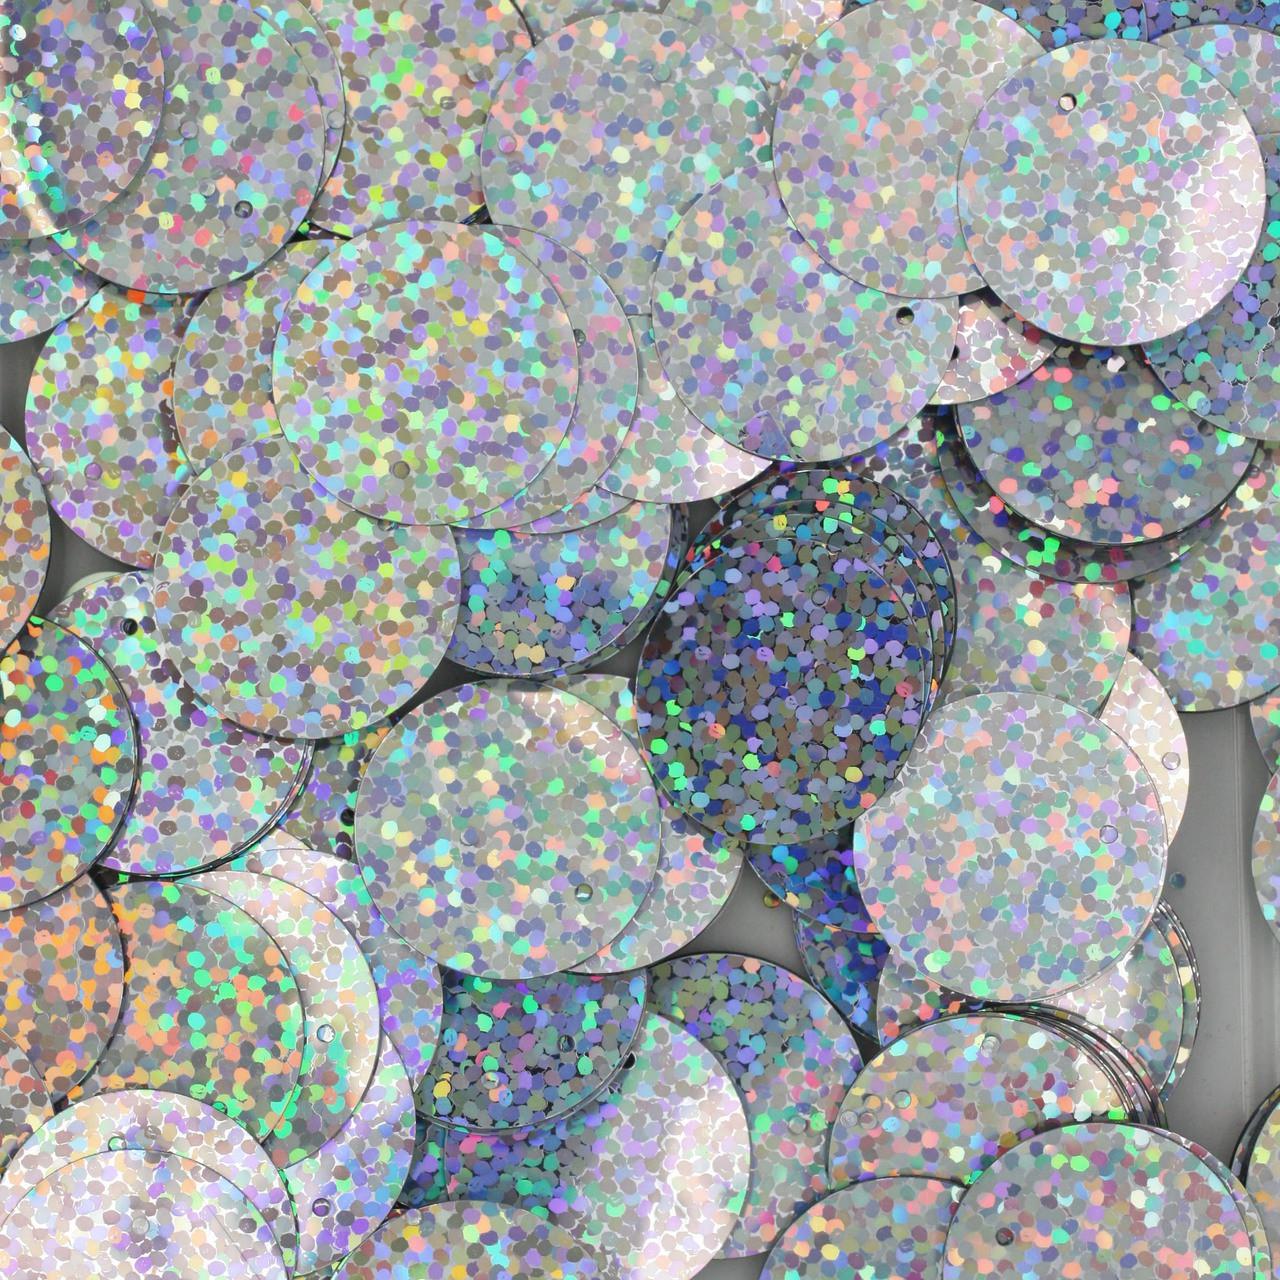 20mm Sequins Silver Hologram Glitter Sparkle Metallic